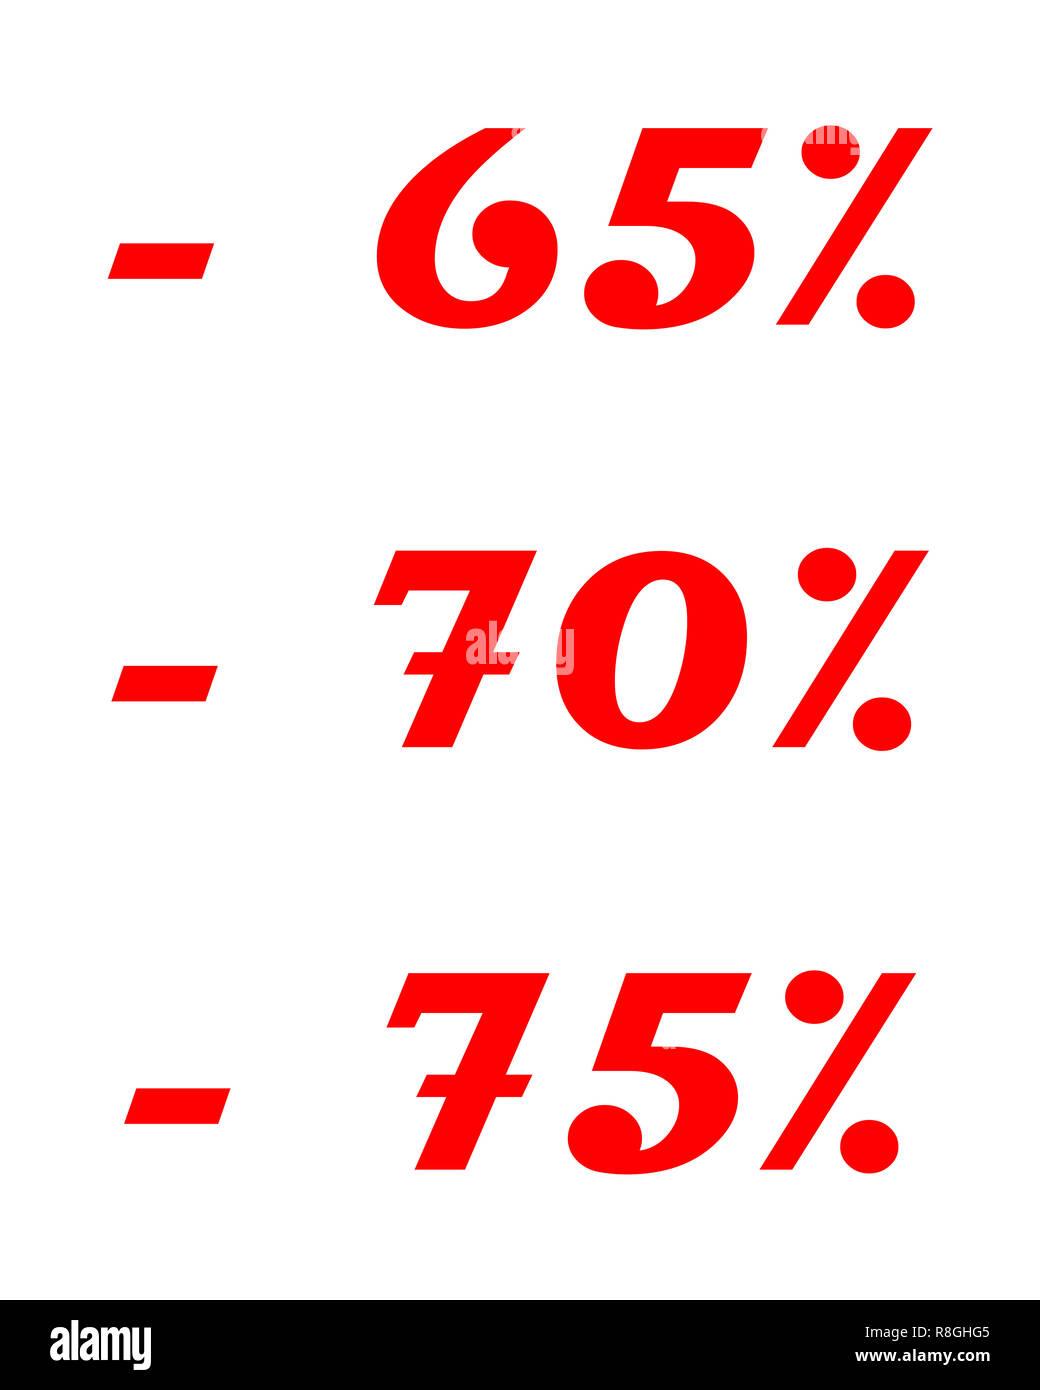 -65% -70% -75% sale discount illustration - Stock Image